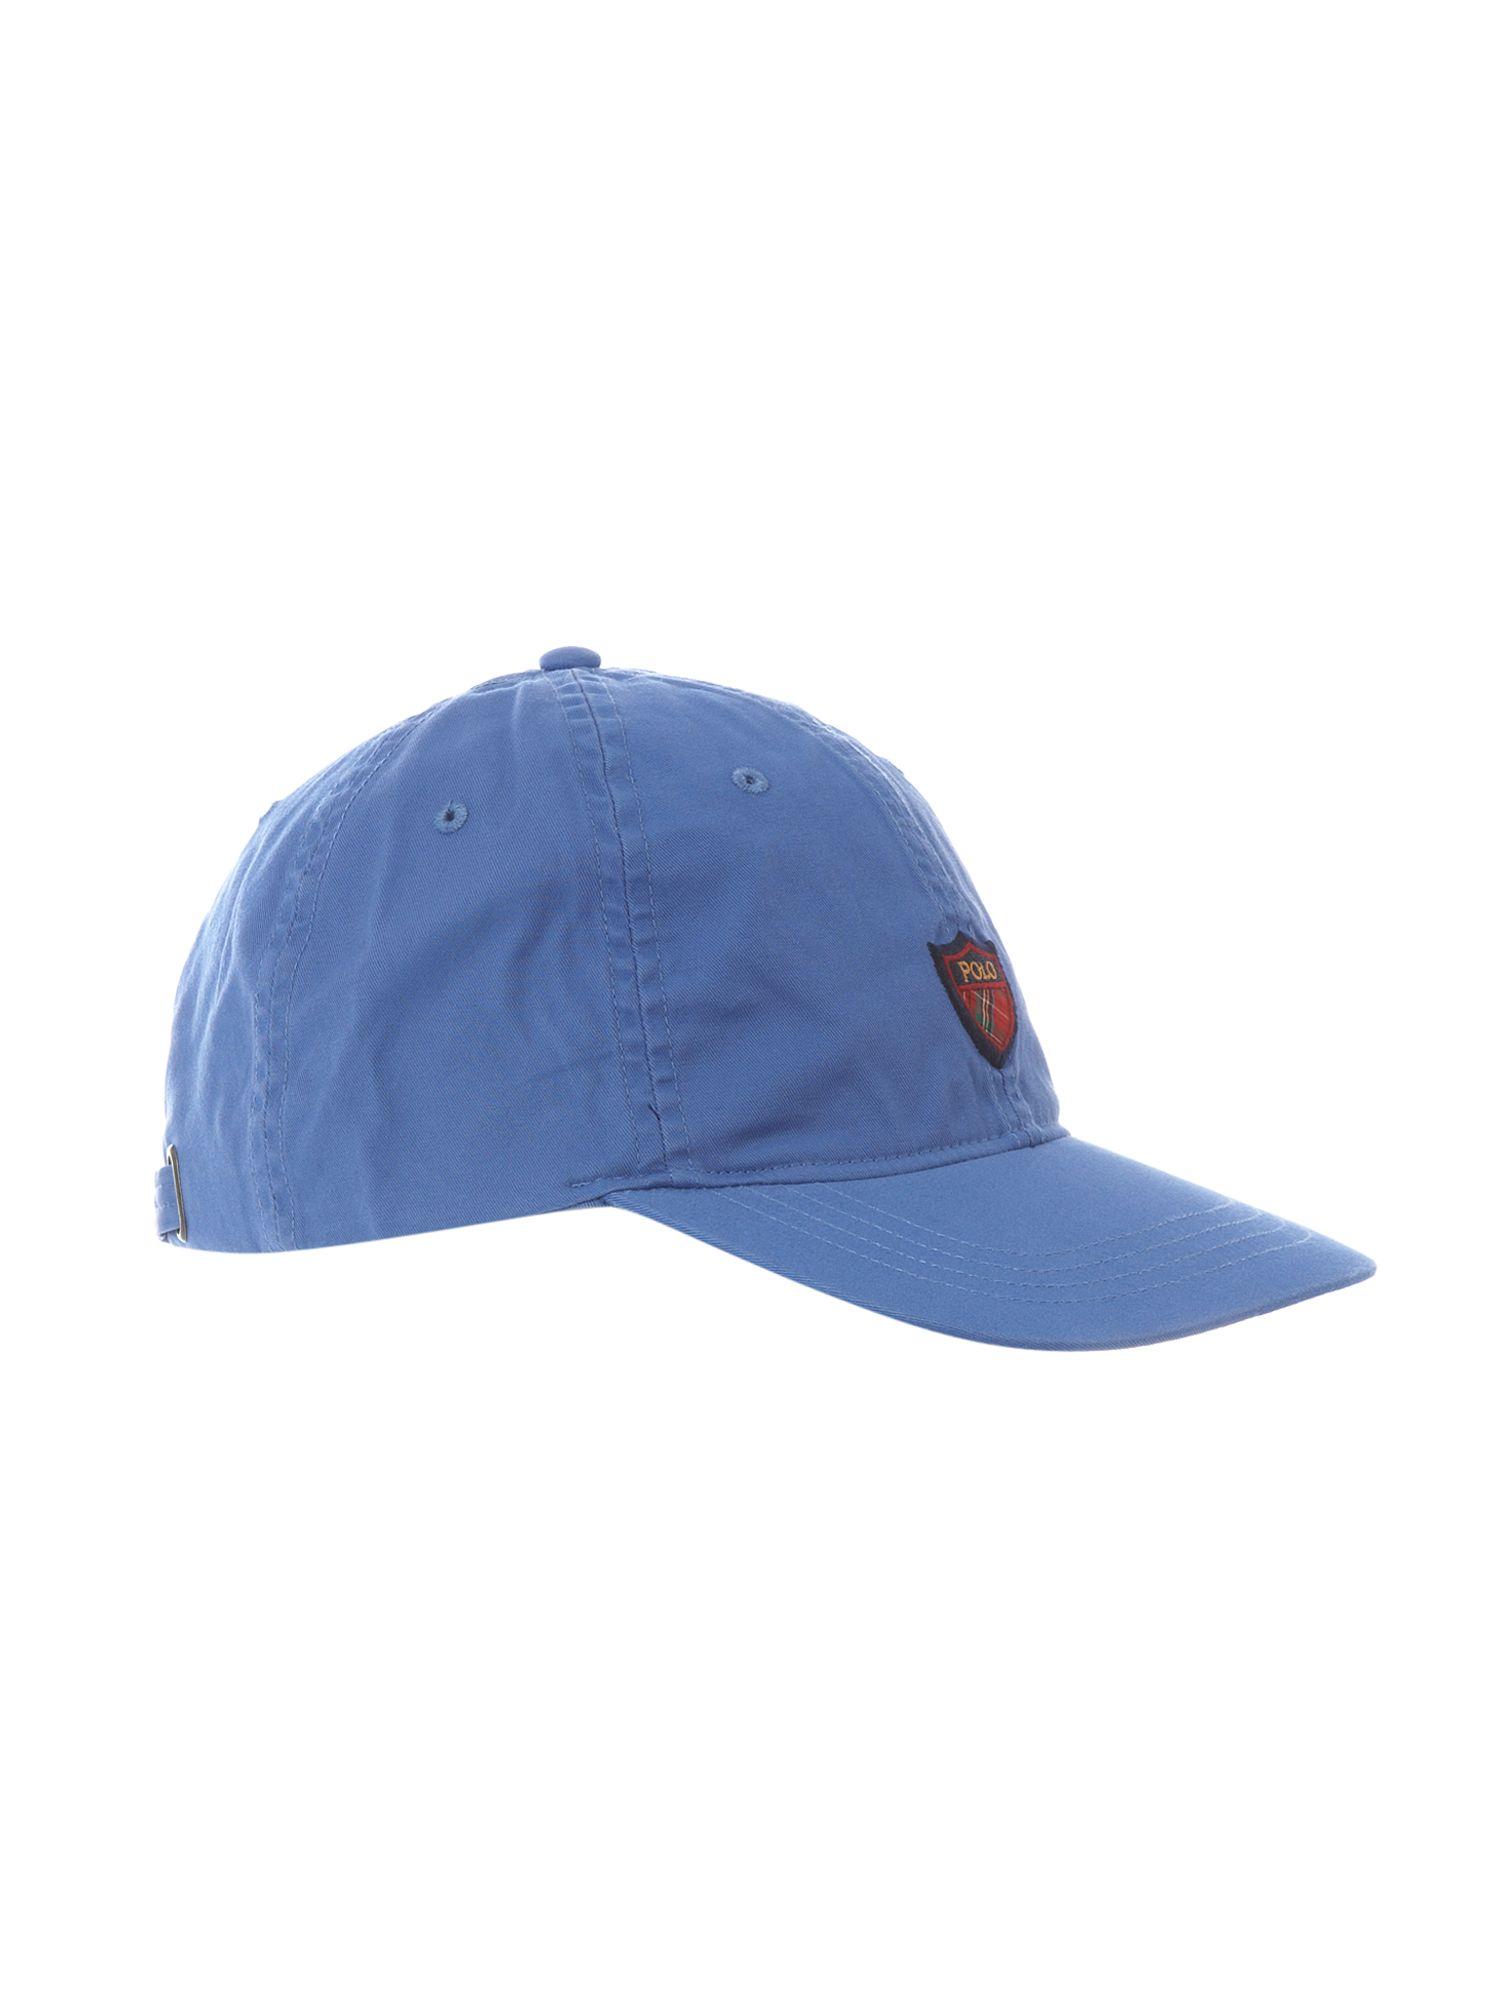 ralph lauren golf badge cap in blue for men lyst. Black Bedroom Furniture Sets. Home Design Ideas